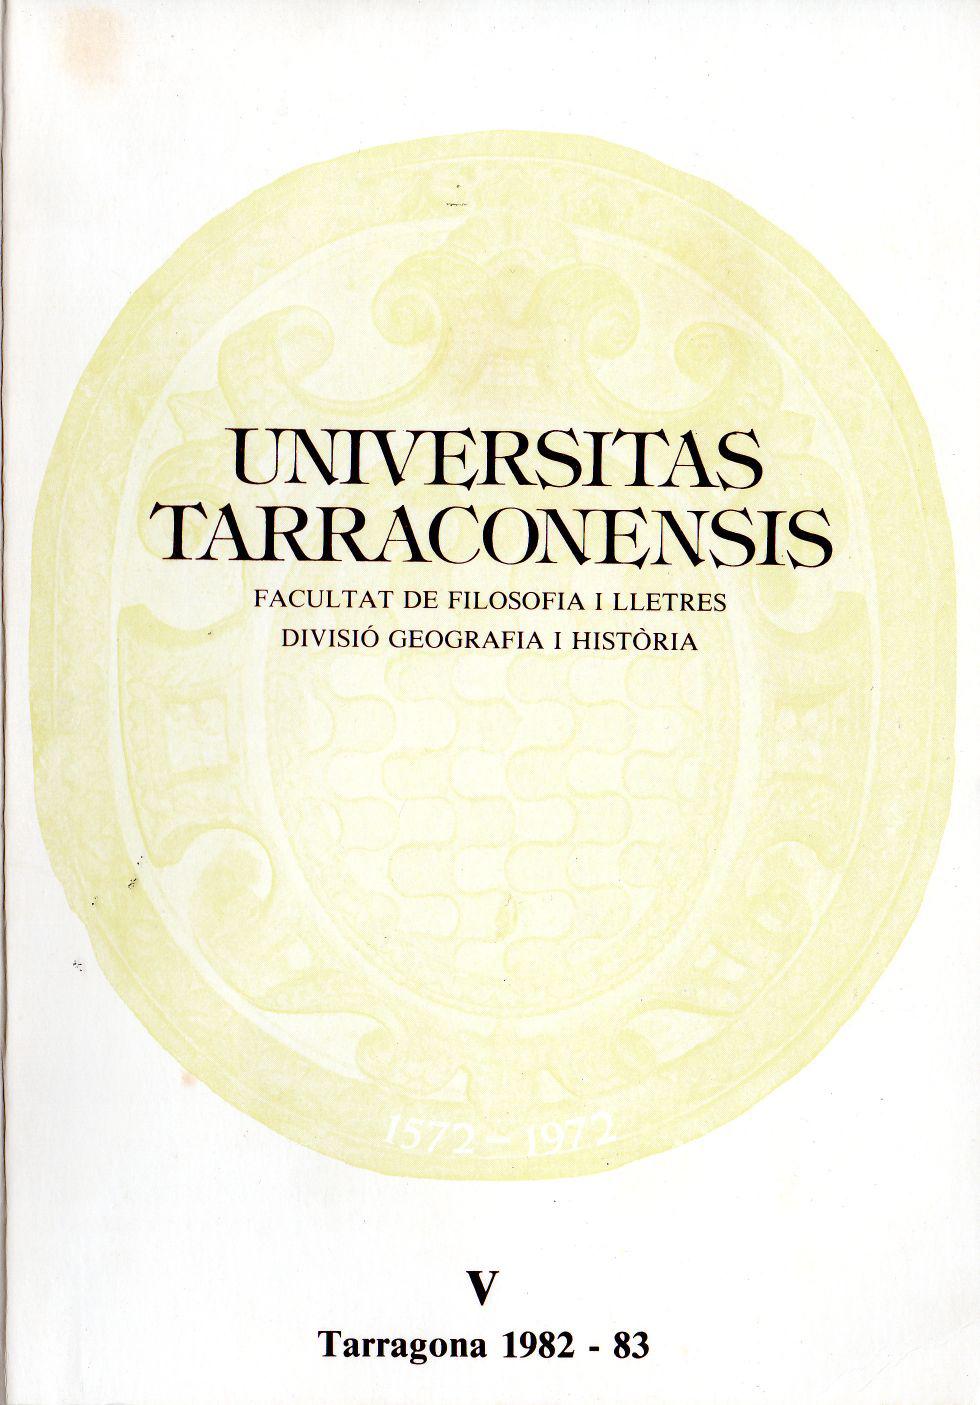 Universitas Tarraconensis. Revista de Geografia, Història i Filosofia. 1982-1983